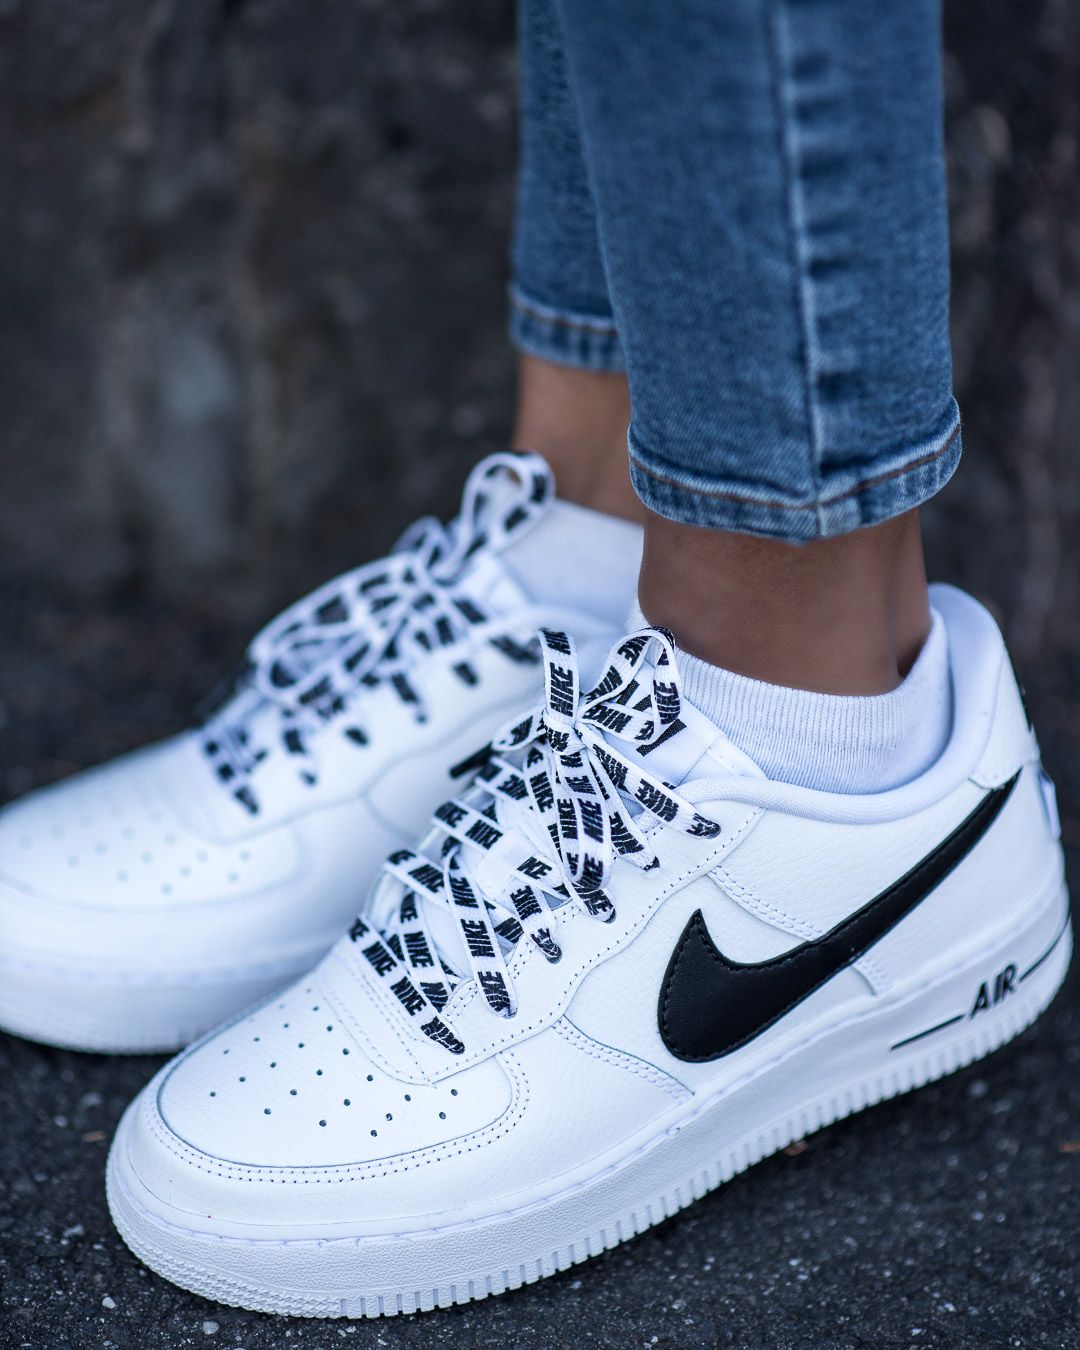 Nike Airforce 1 Sneakers Of The Month Pose Repeat White Nike Shoes Sneaker Heels High Heel Sneakers